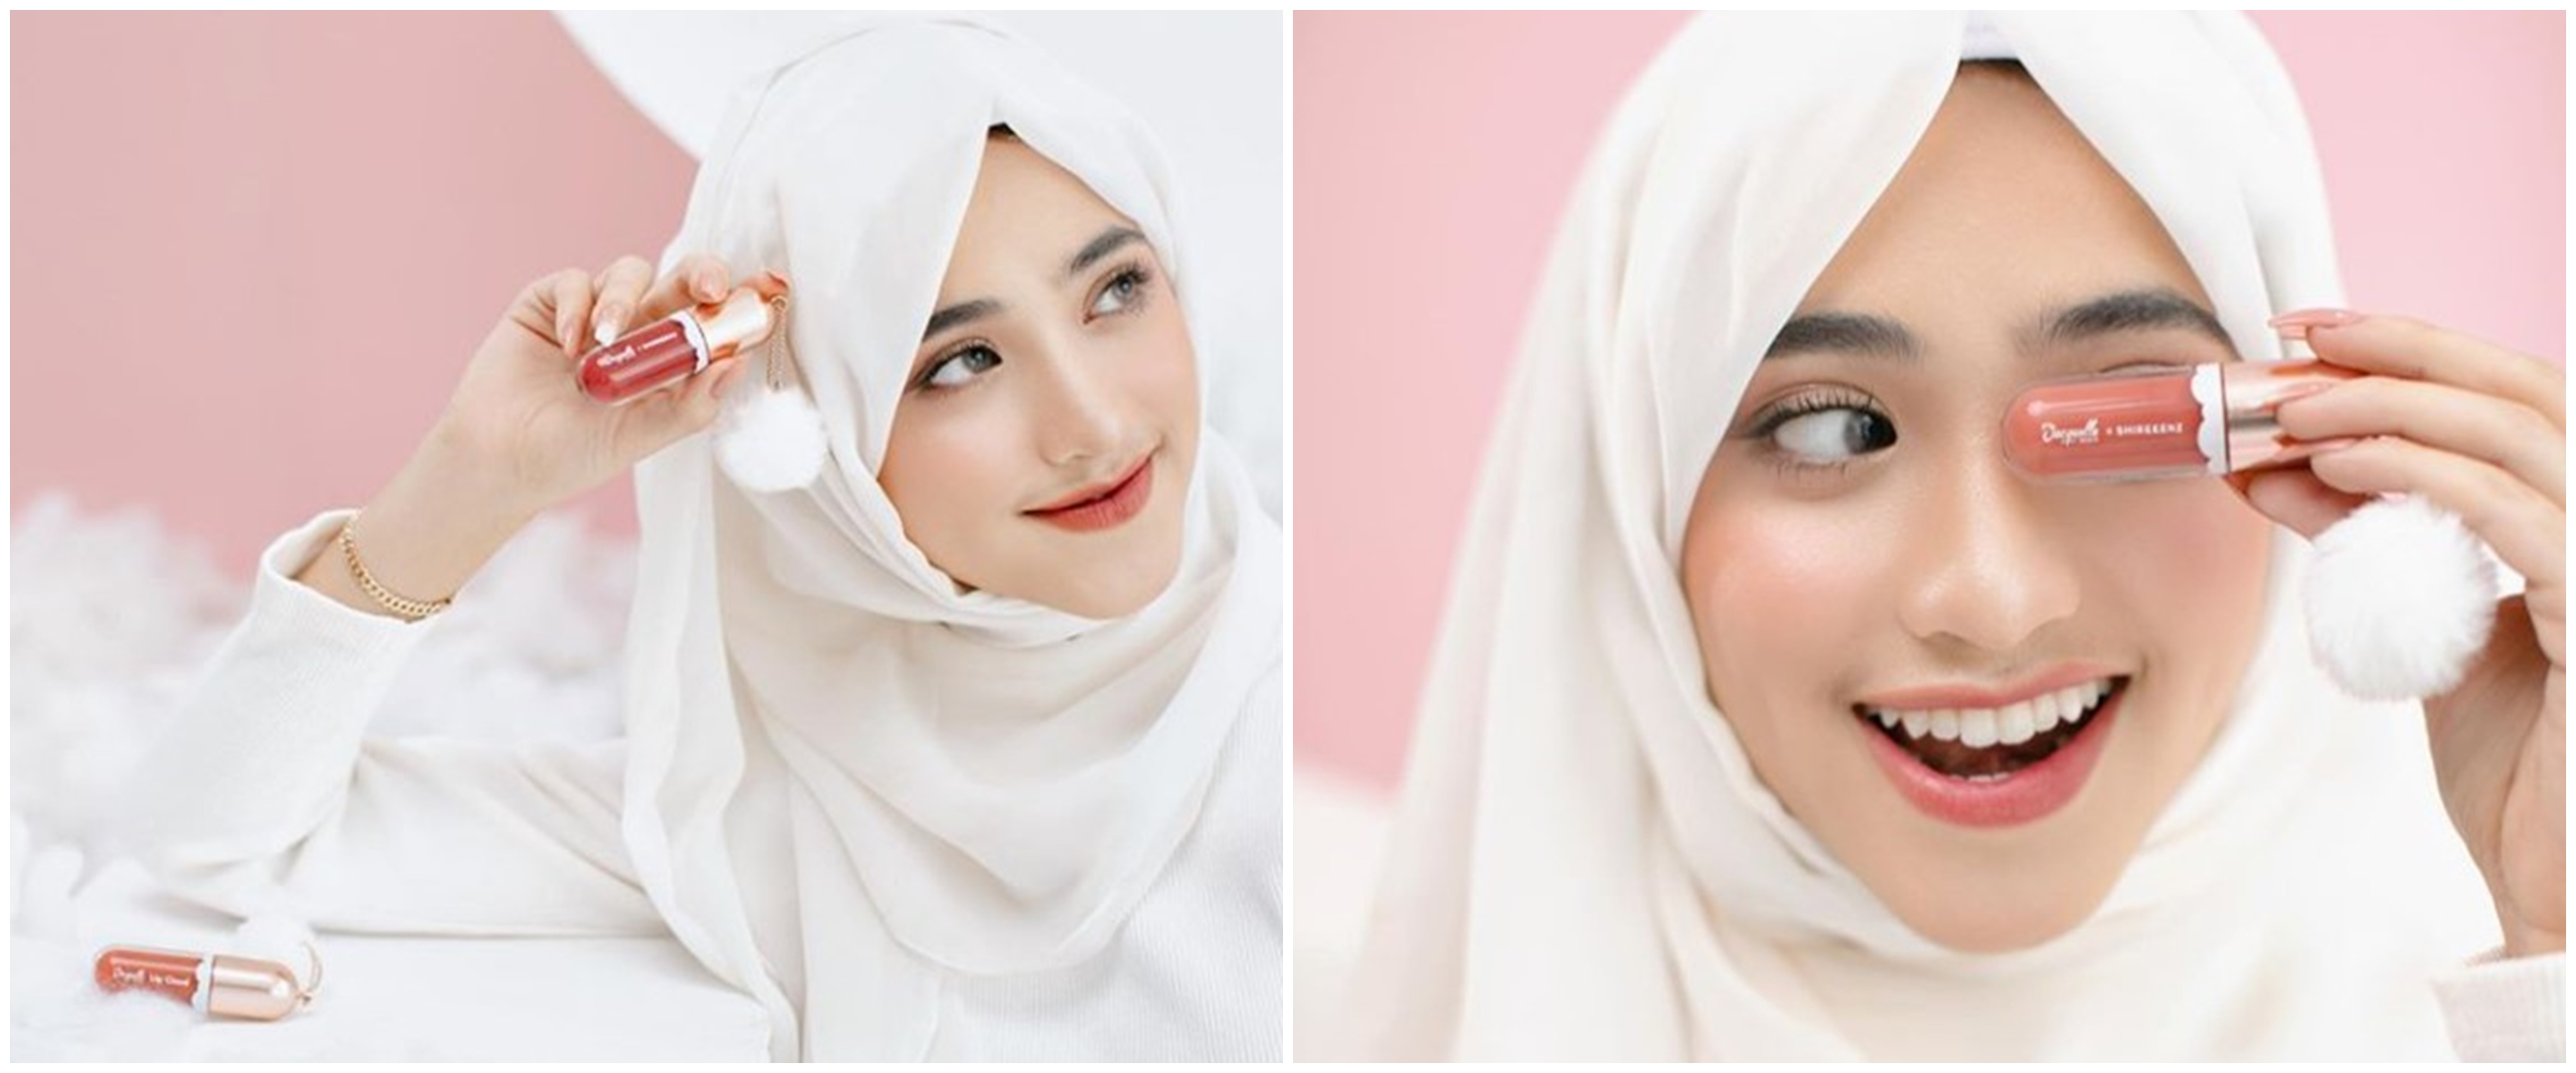 Rahasia tampil cantik ala Shirin Al Athrus, bikin percaya diri